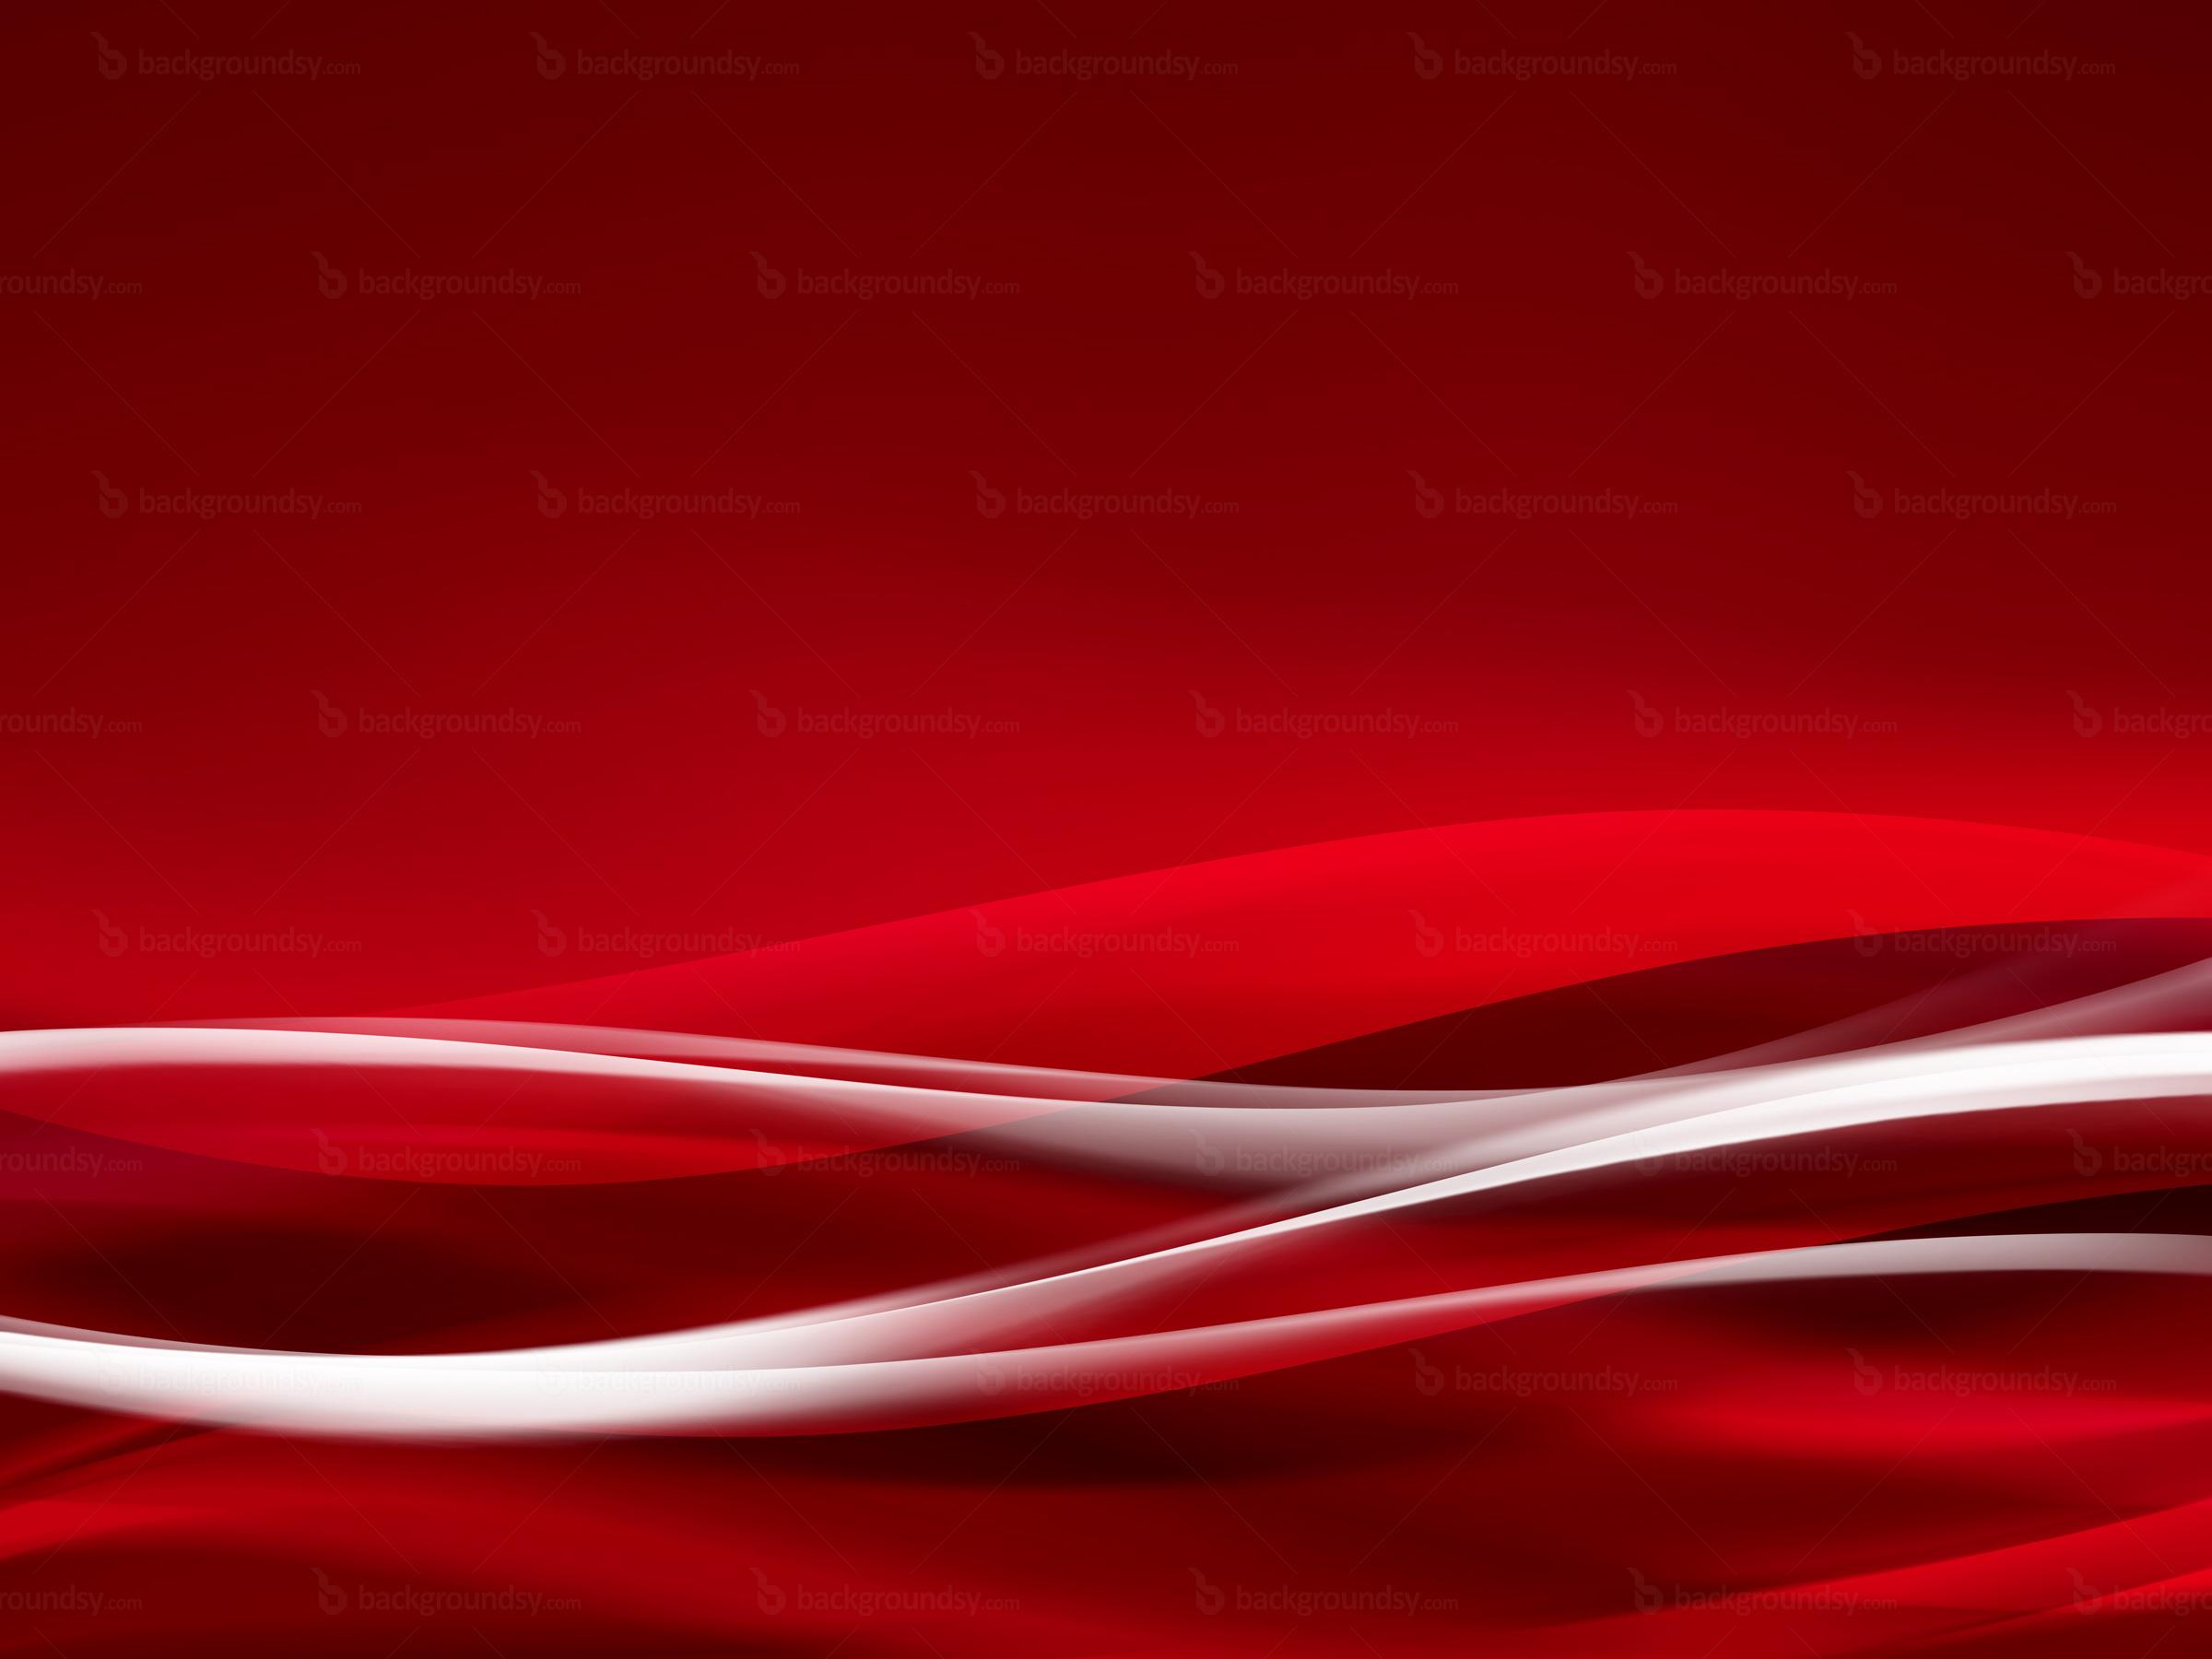 Free red wallpaper wallpapersafari for Red wallpaper ideas